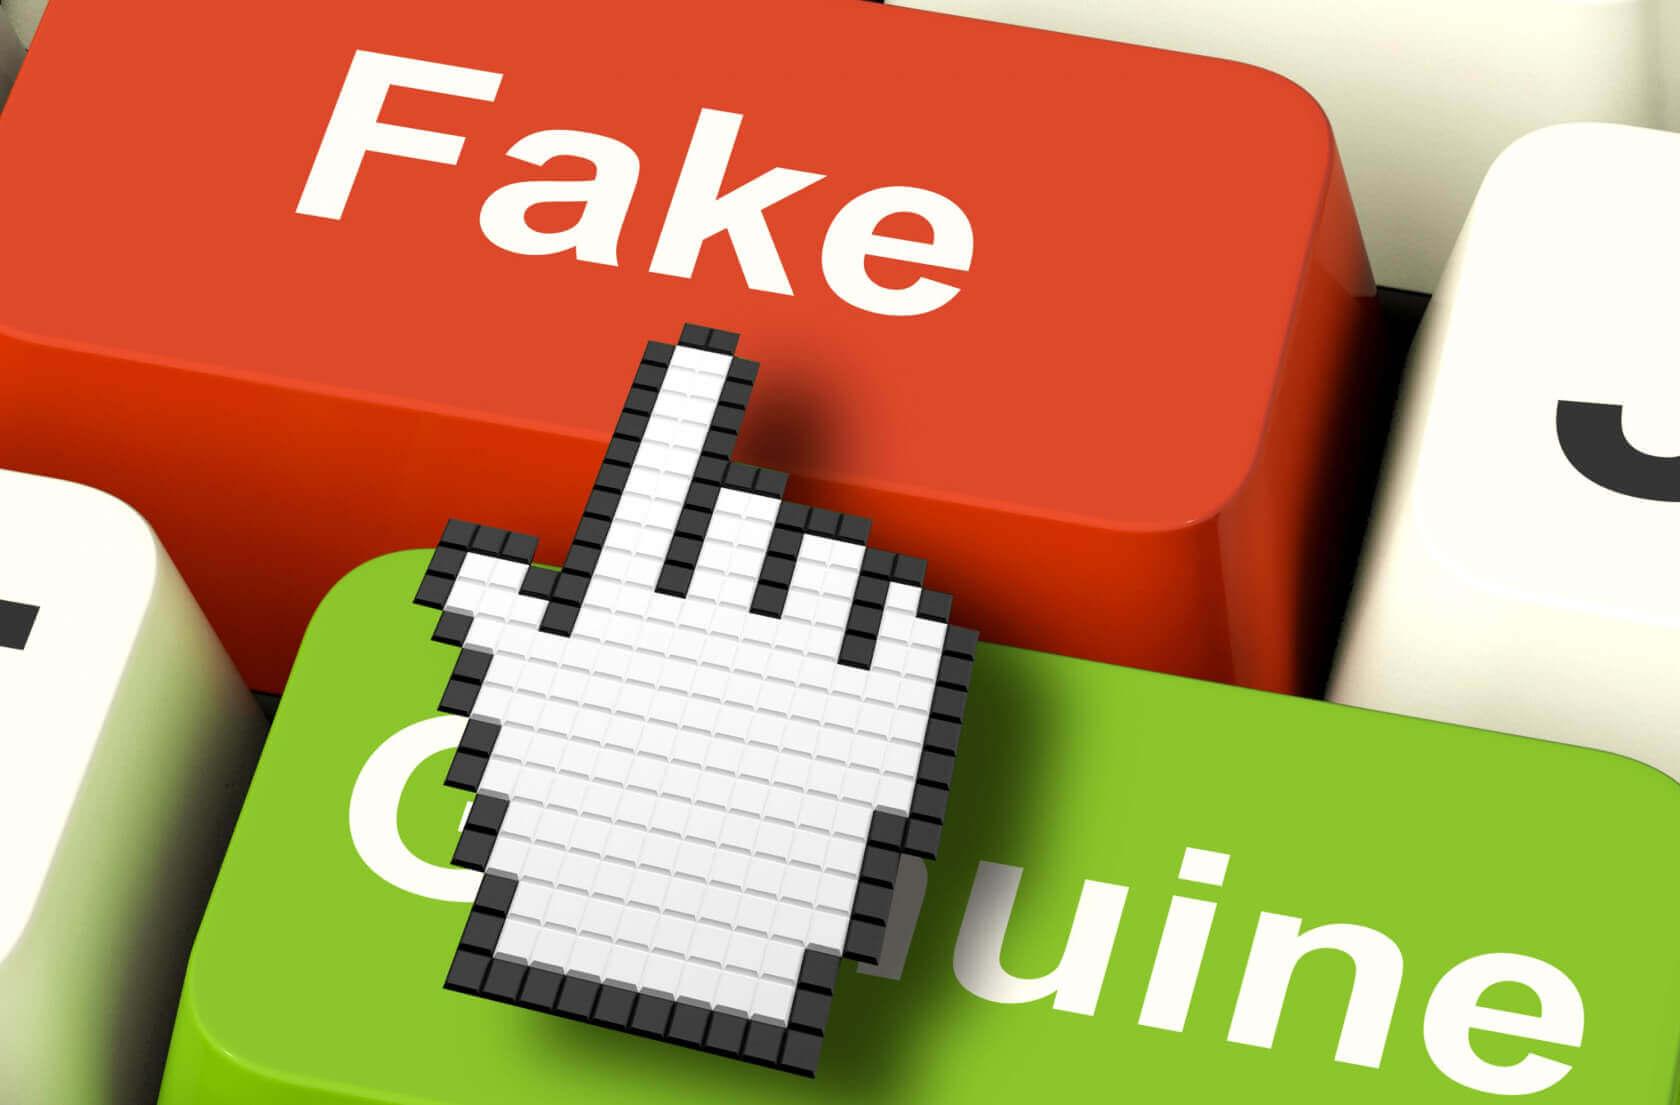 Facebook anuncia serviço para detectar e combater 'fake news' no Brasil